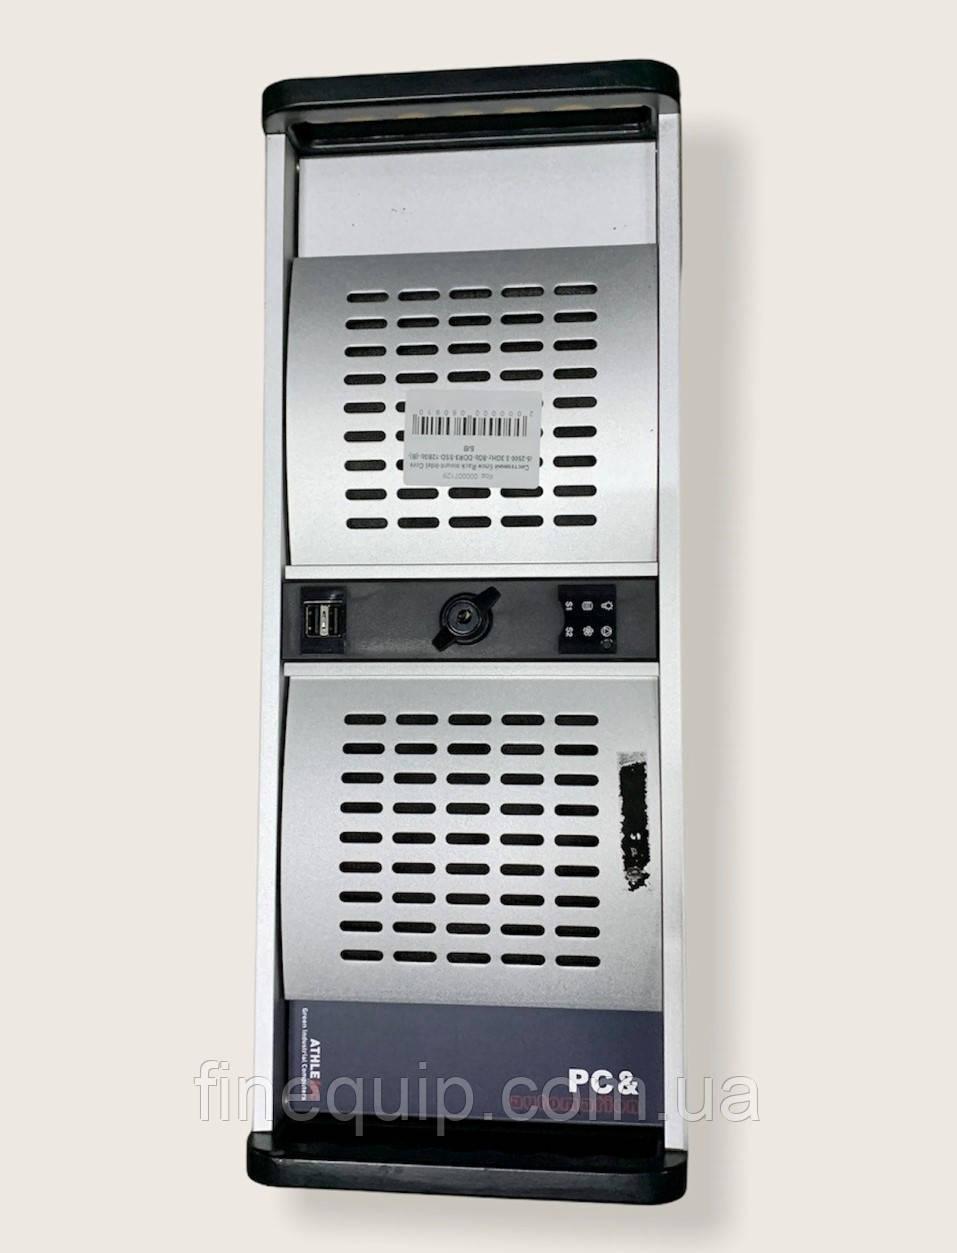 Системний блок-Rack mount-Intel Core i3-2130-3.4GHz-8Gb-DDR3-HDD-500Gb-(B)- Б/В